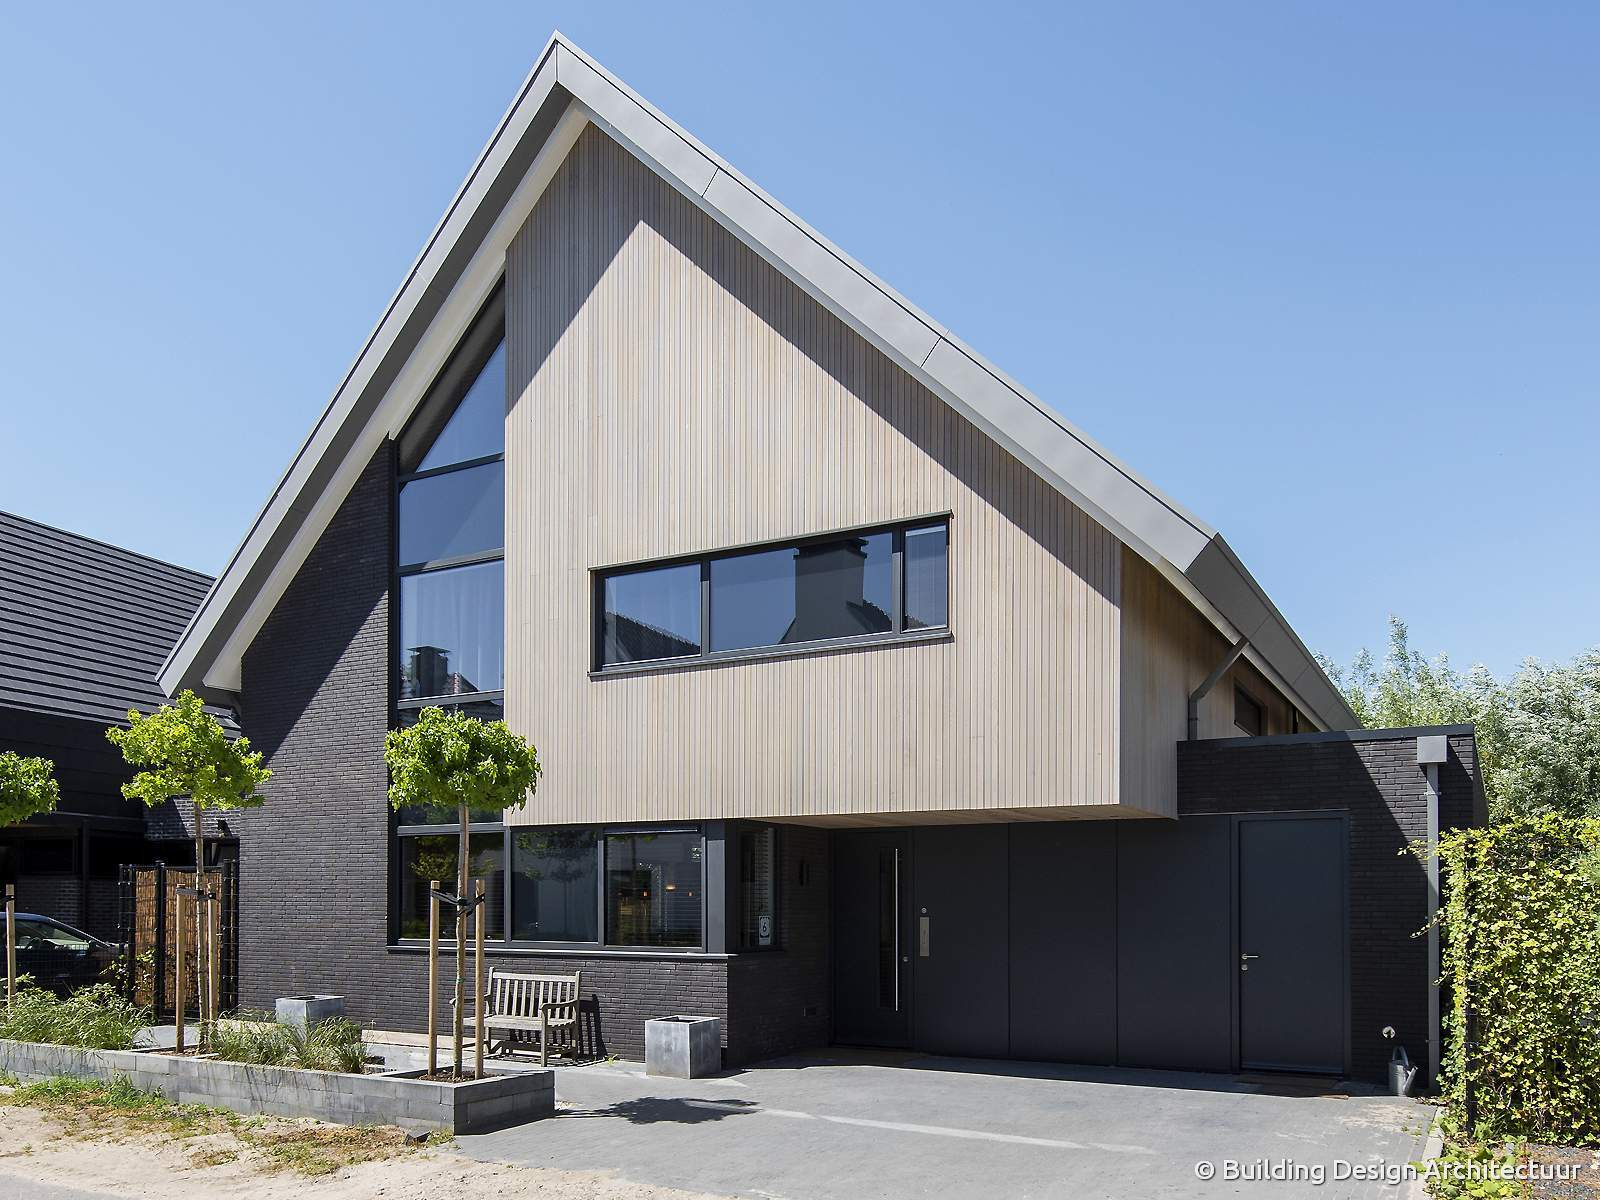 Building design architectuur - Exterieur ingang eigentijds huis ...